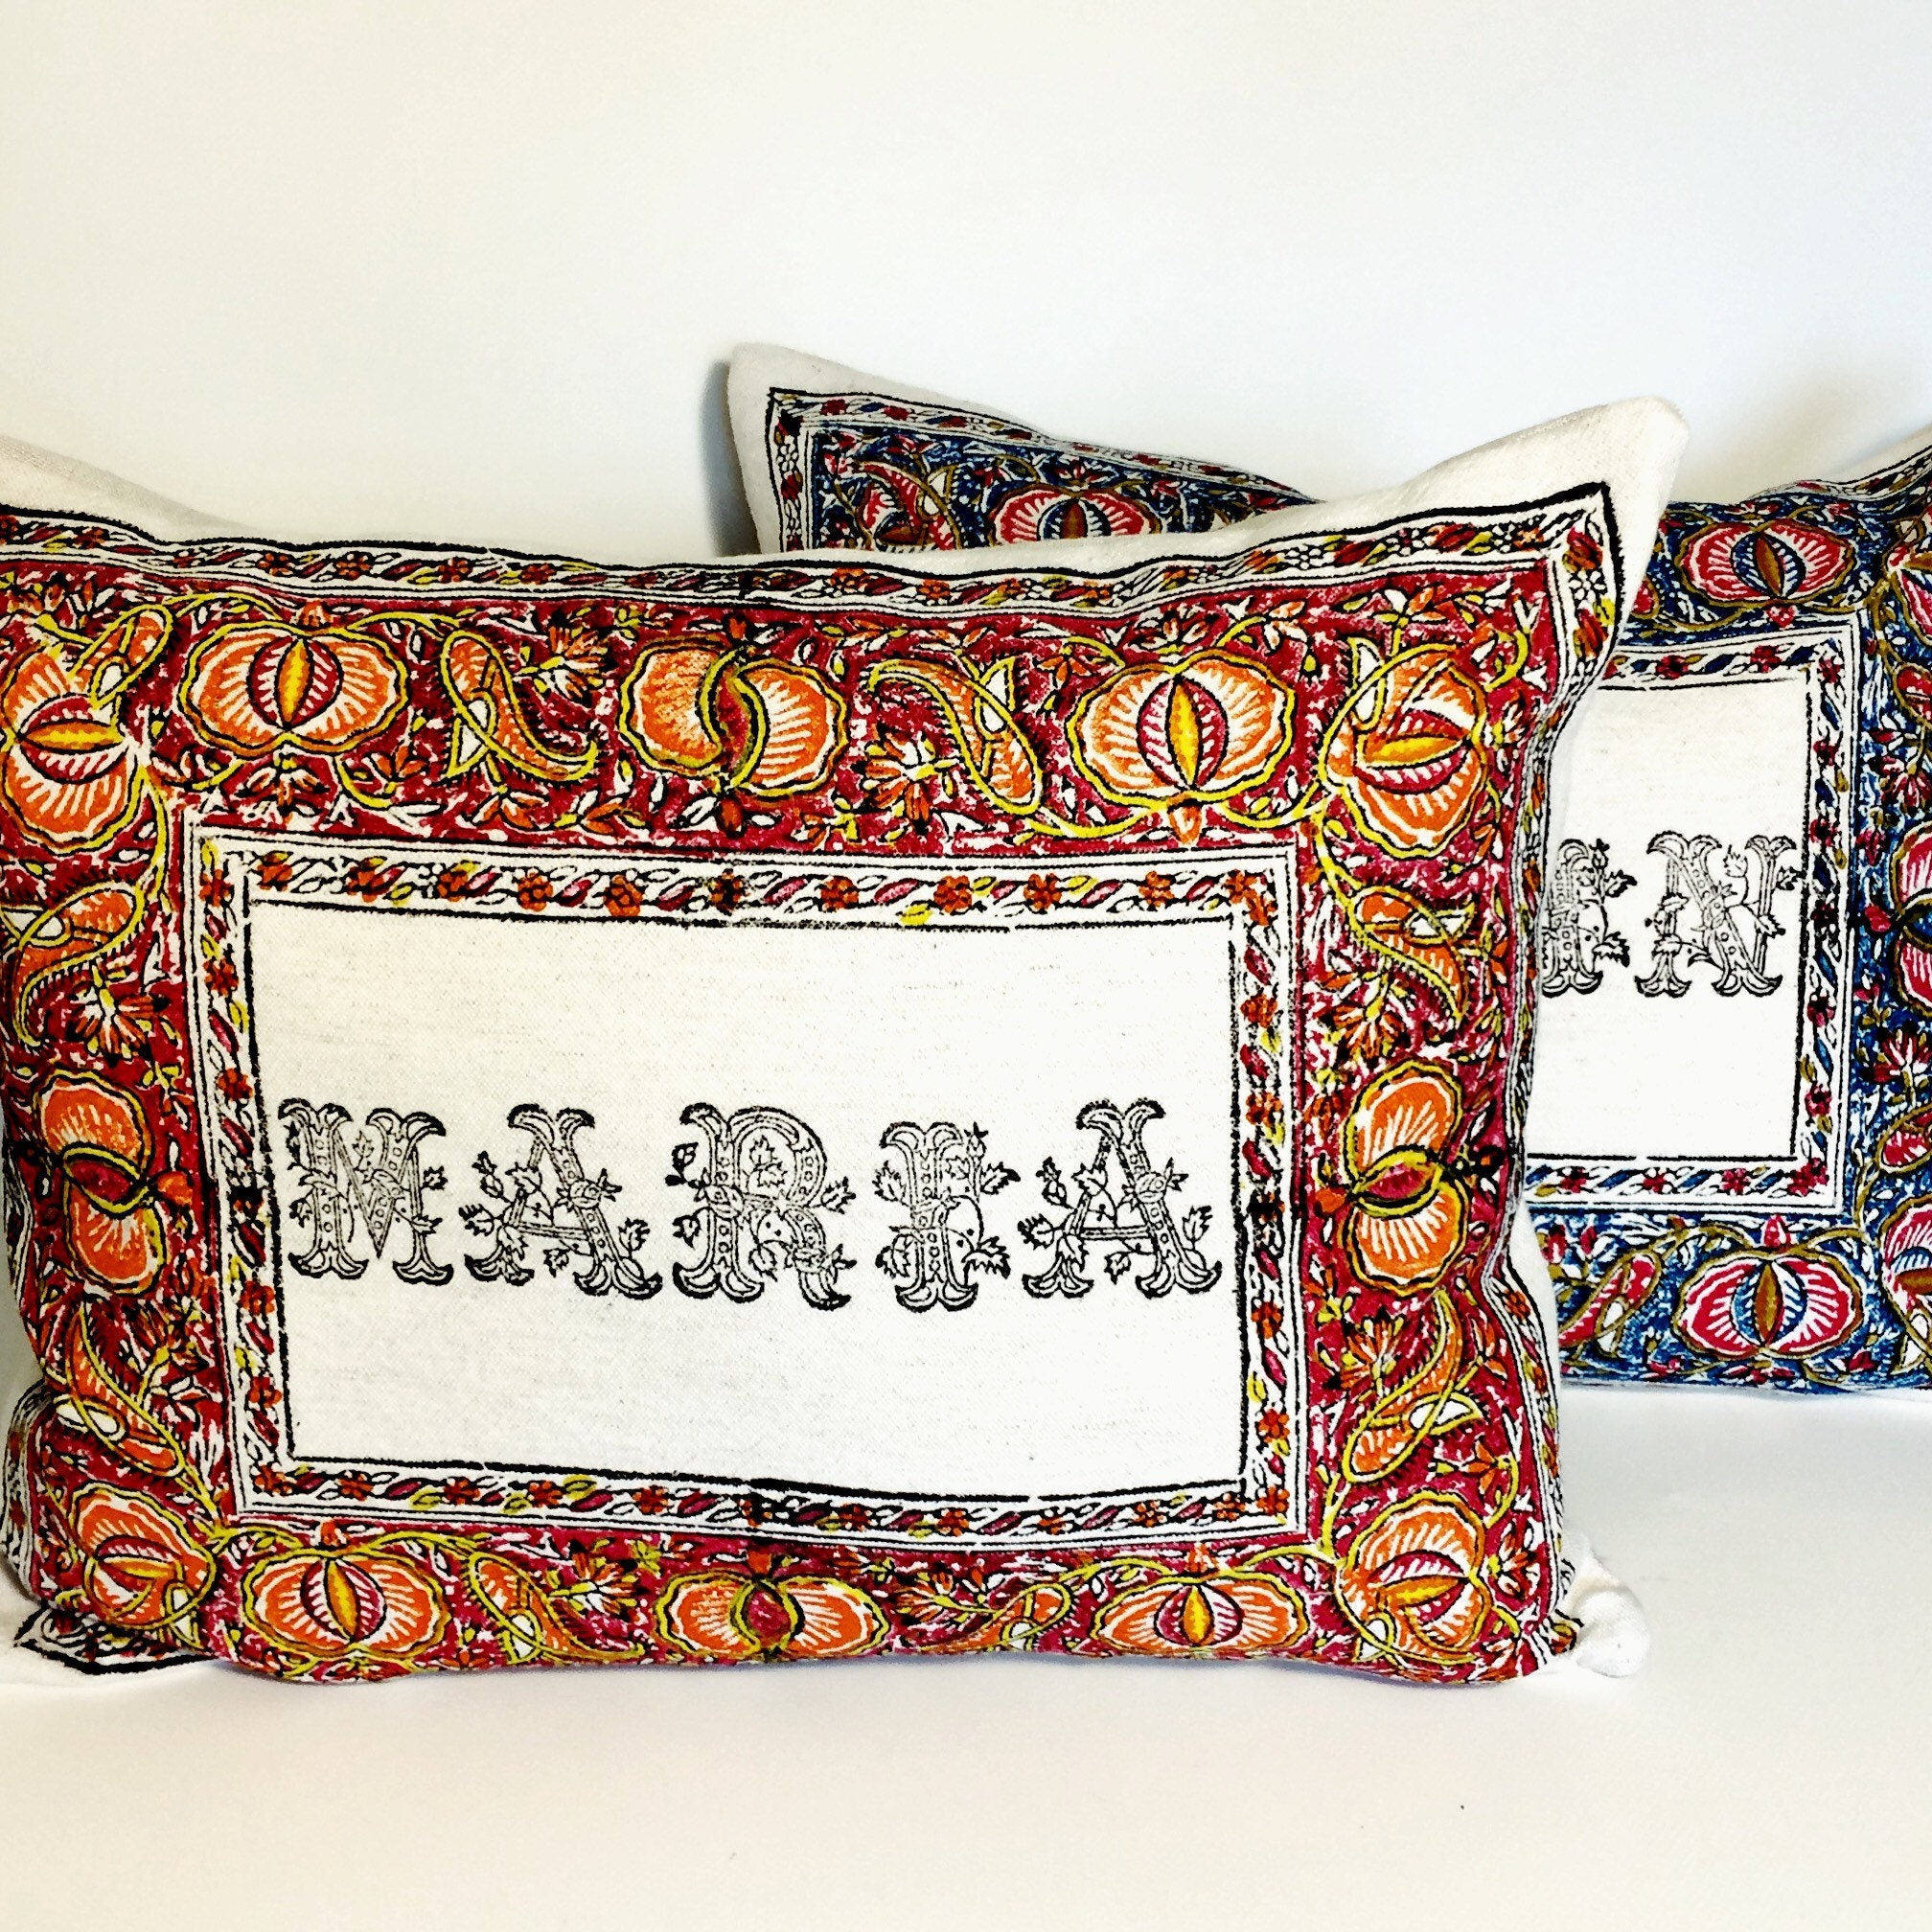 kokoleo com pillow pillows back to penelope page personalizedpillows personalized